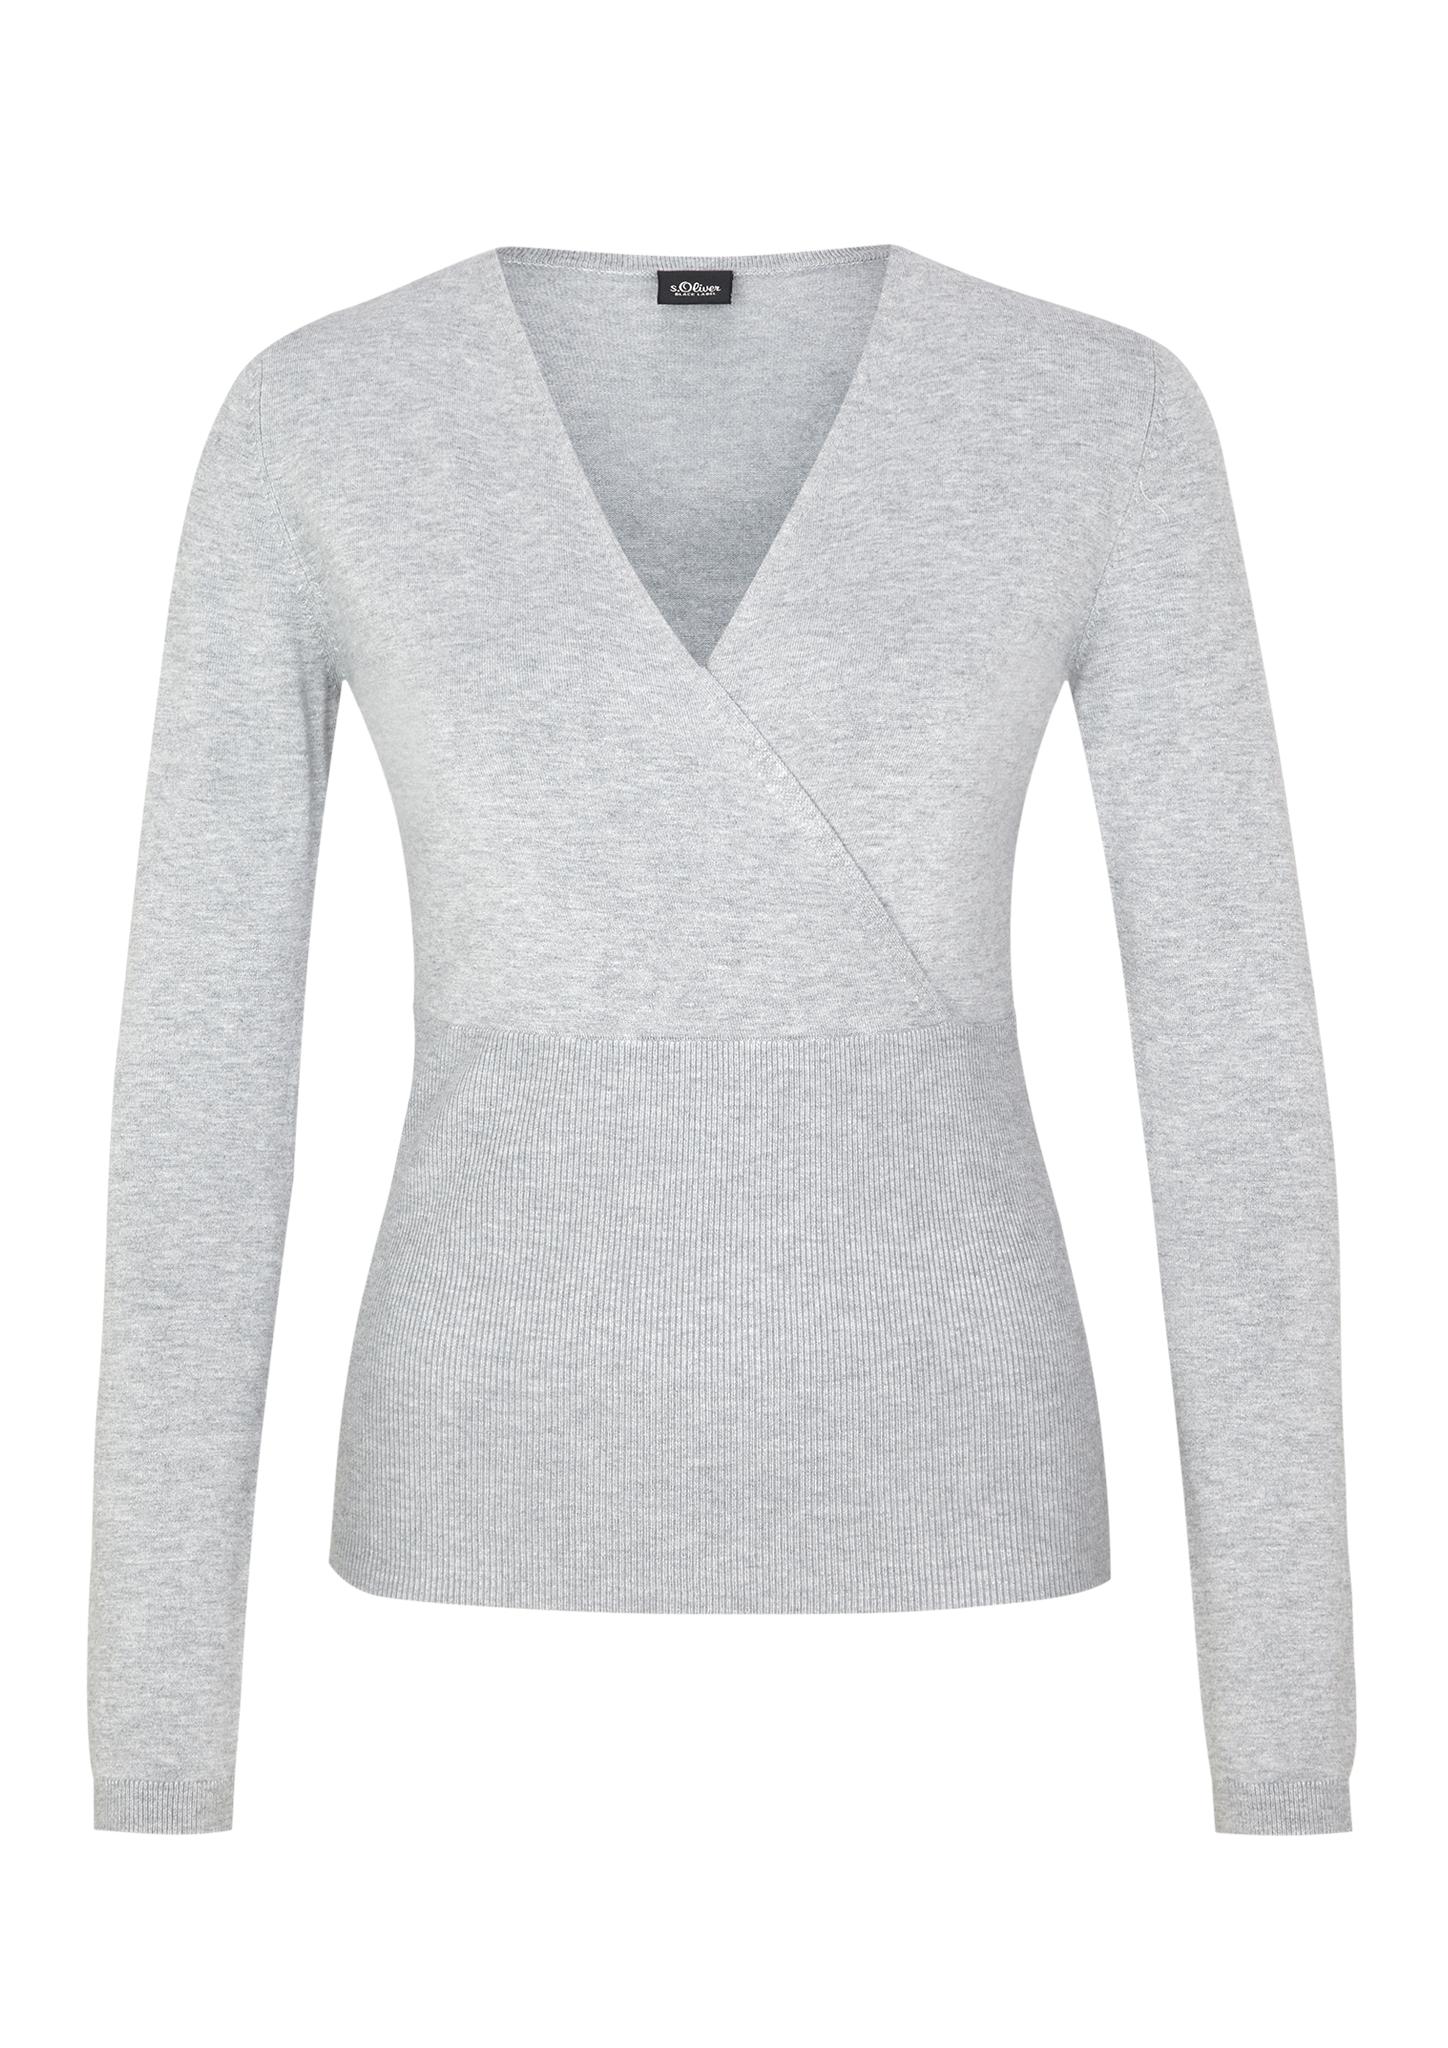 Wickel-Pullover | Bekleidung > Pullover > Wickelpullover | Grau/schwarz | 81% viskose -  17% polyamid -  2% elasthan | s.Oliver BLACK LABEL